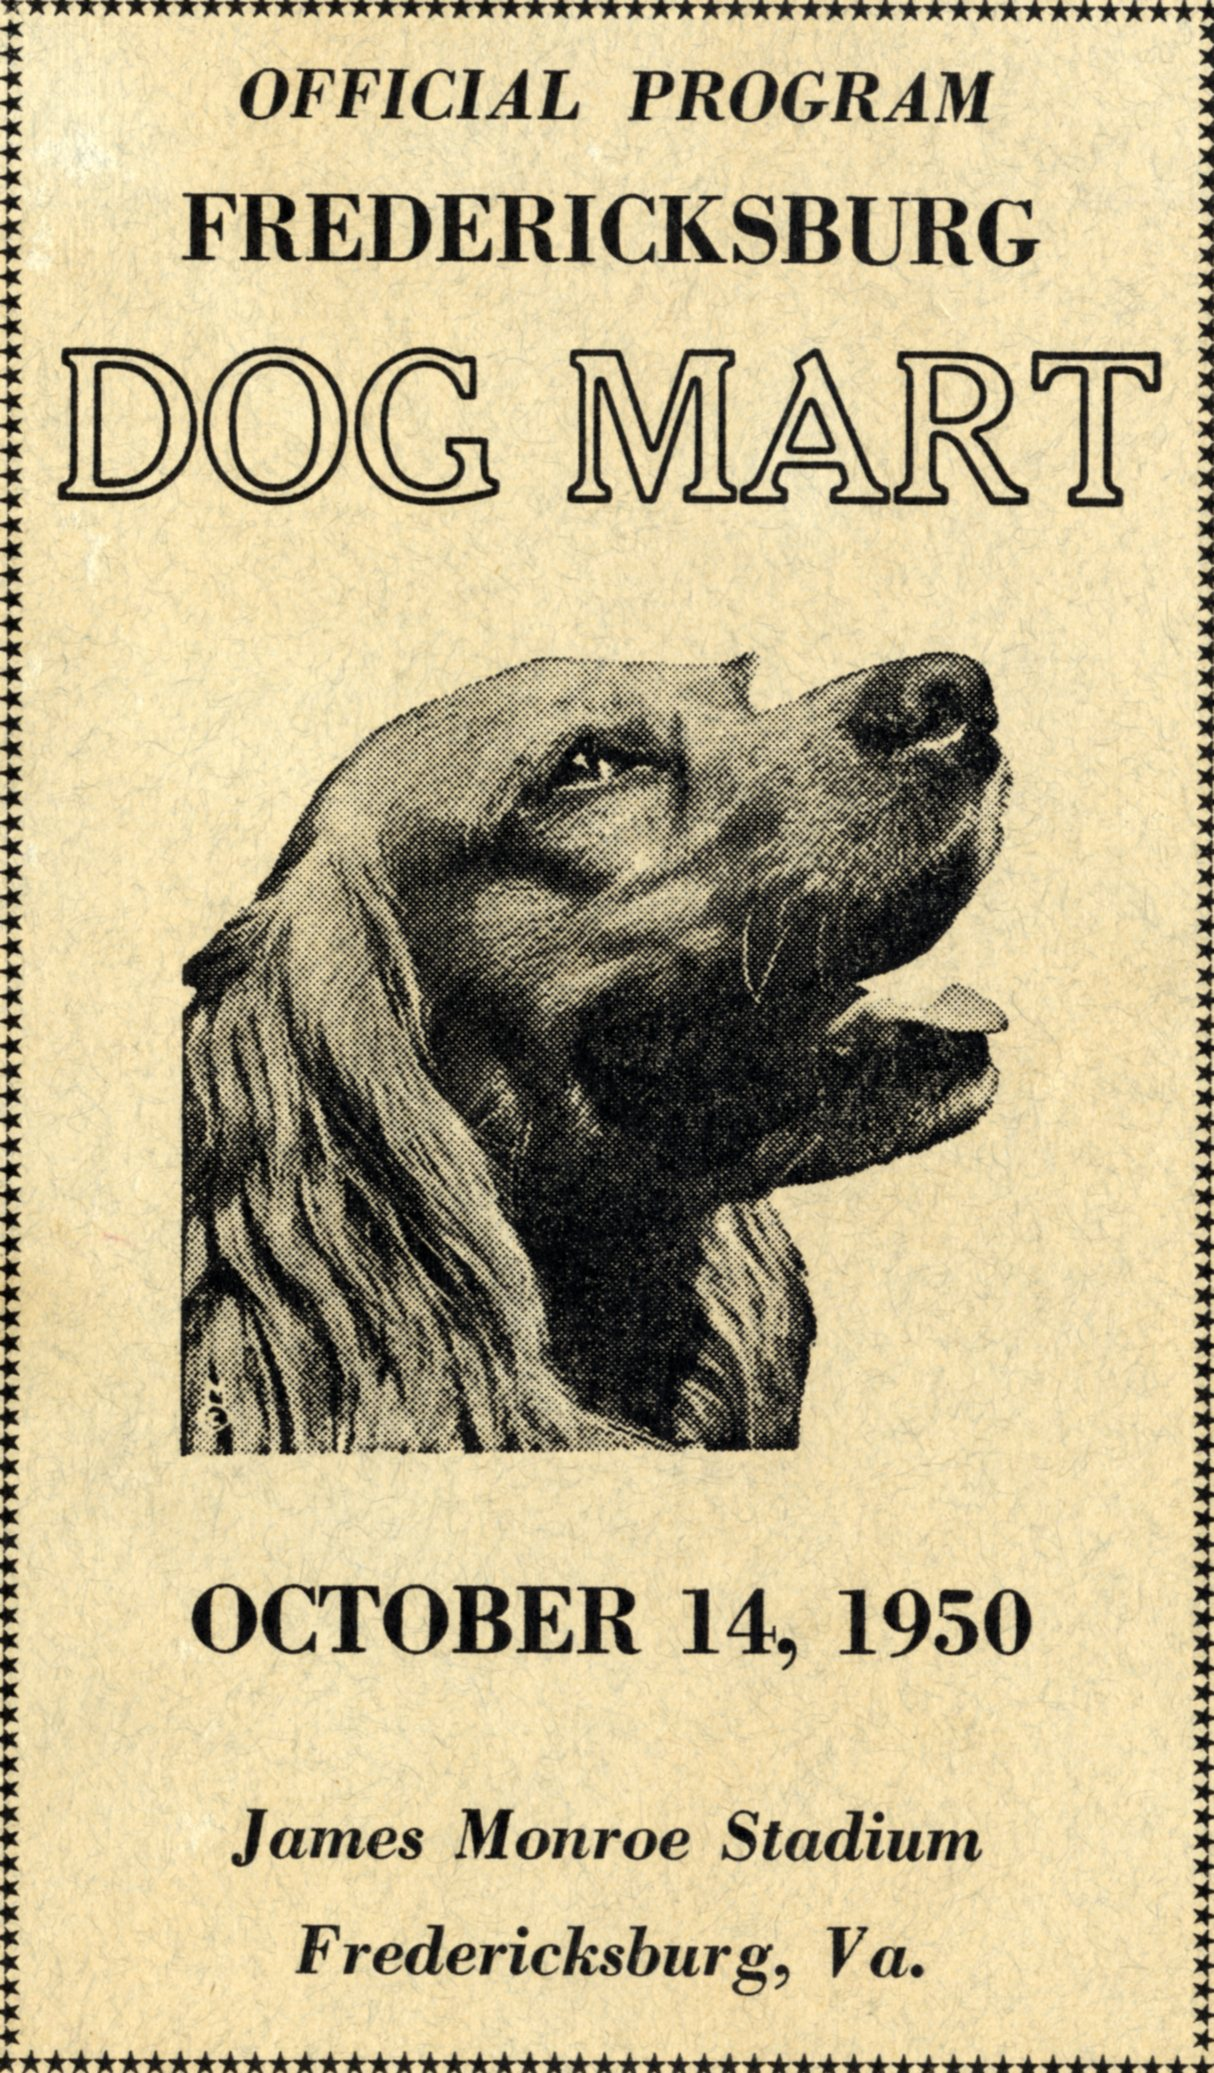 Dog Mart Program